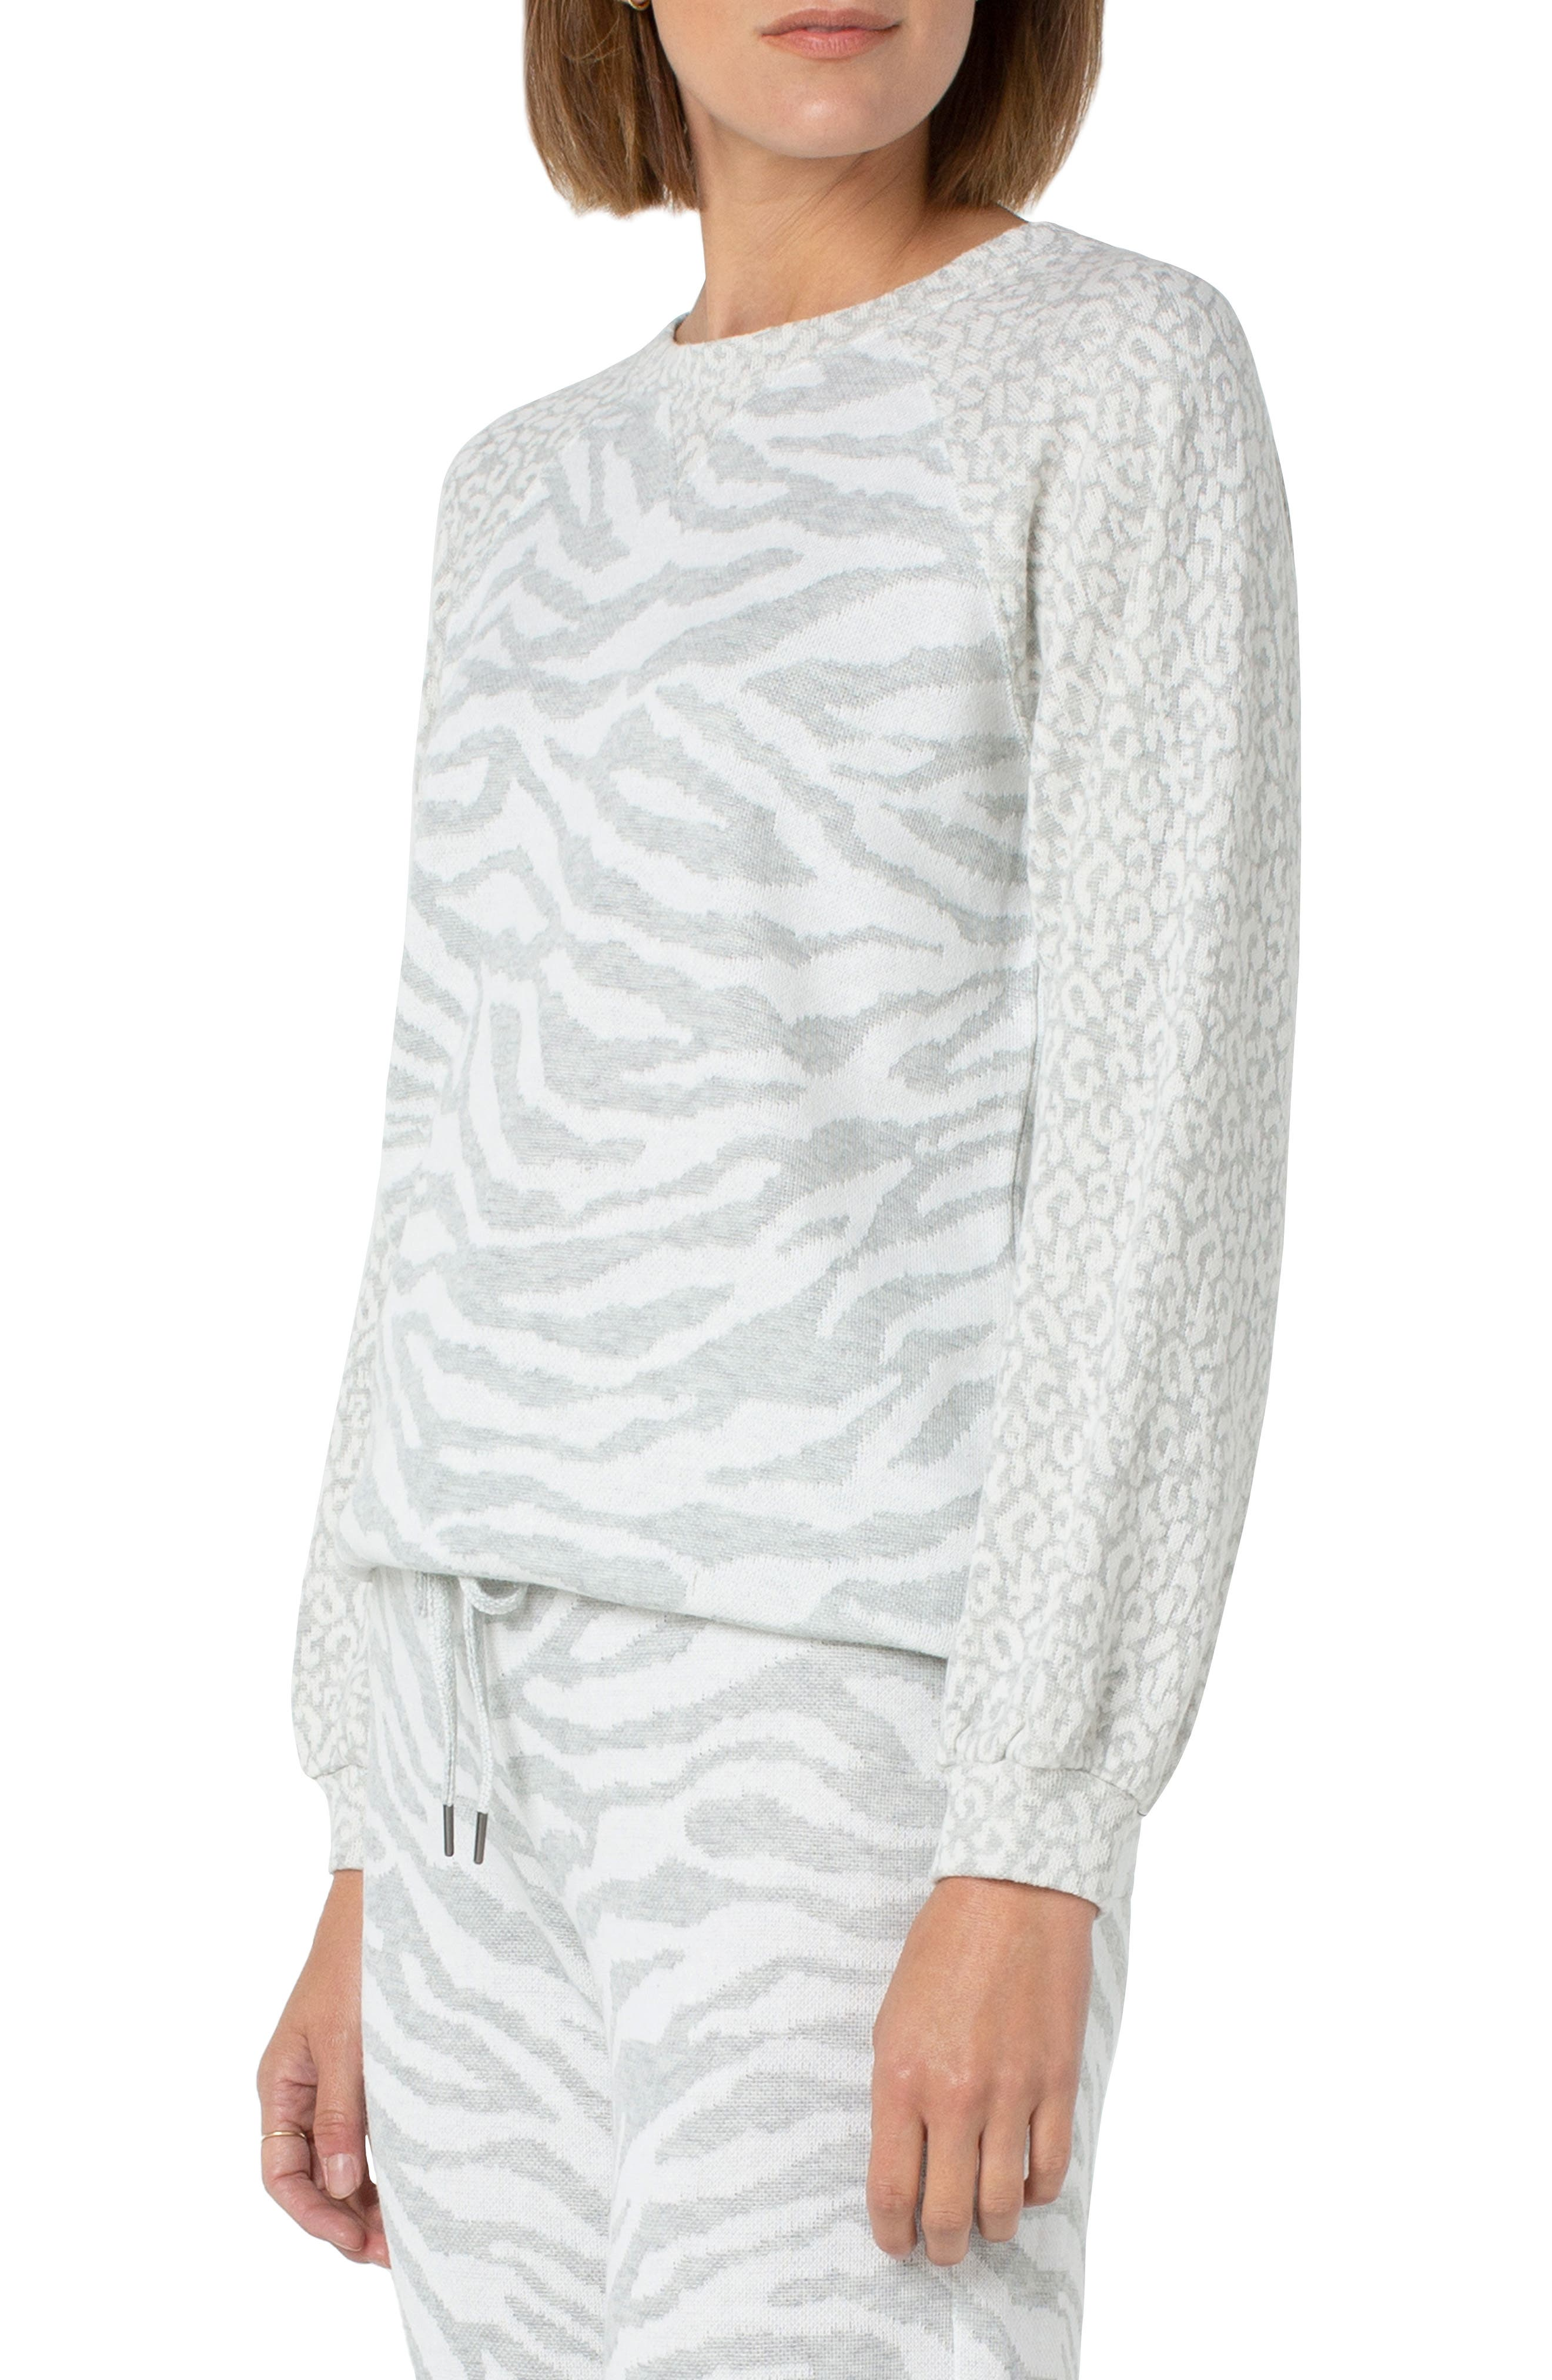 Mix Animal Stripe Jacquard Sweater